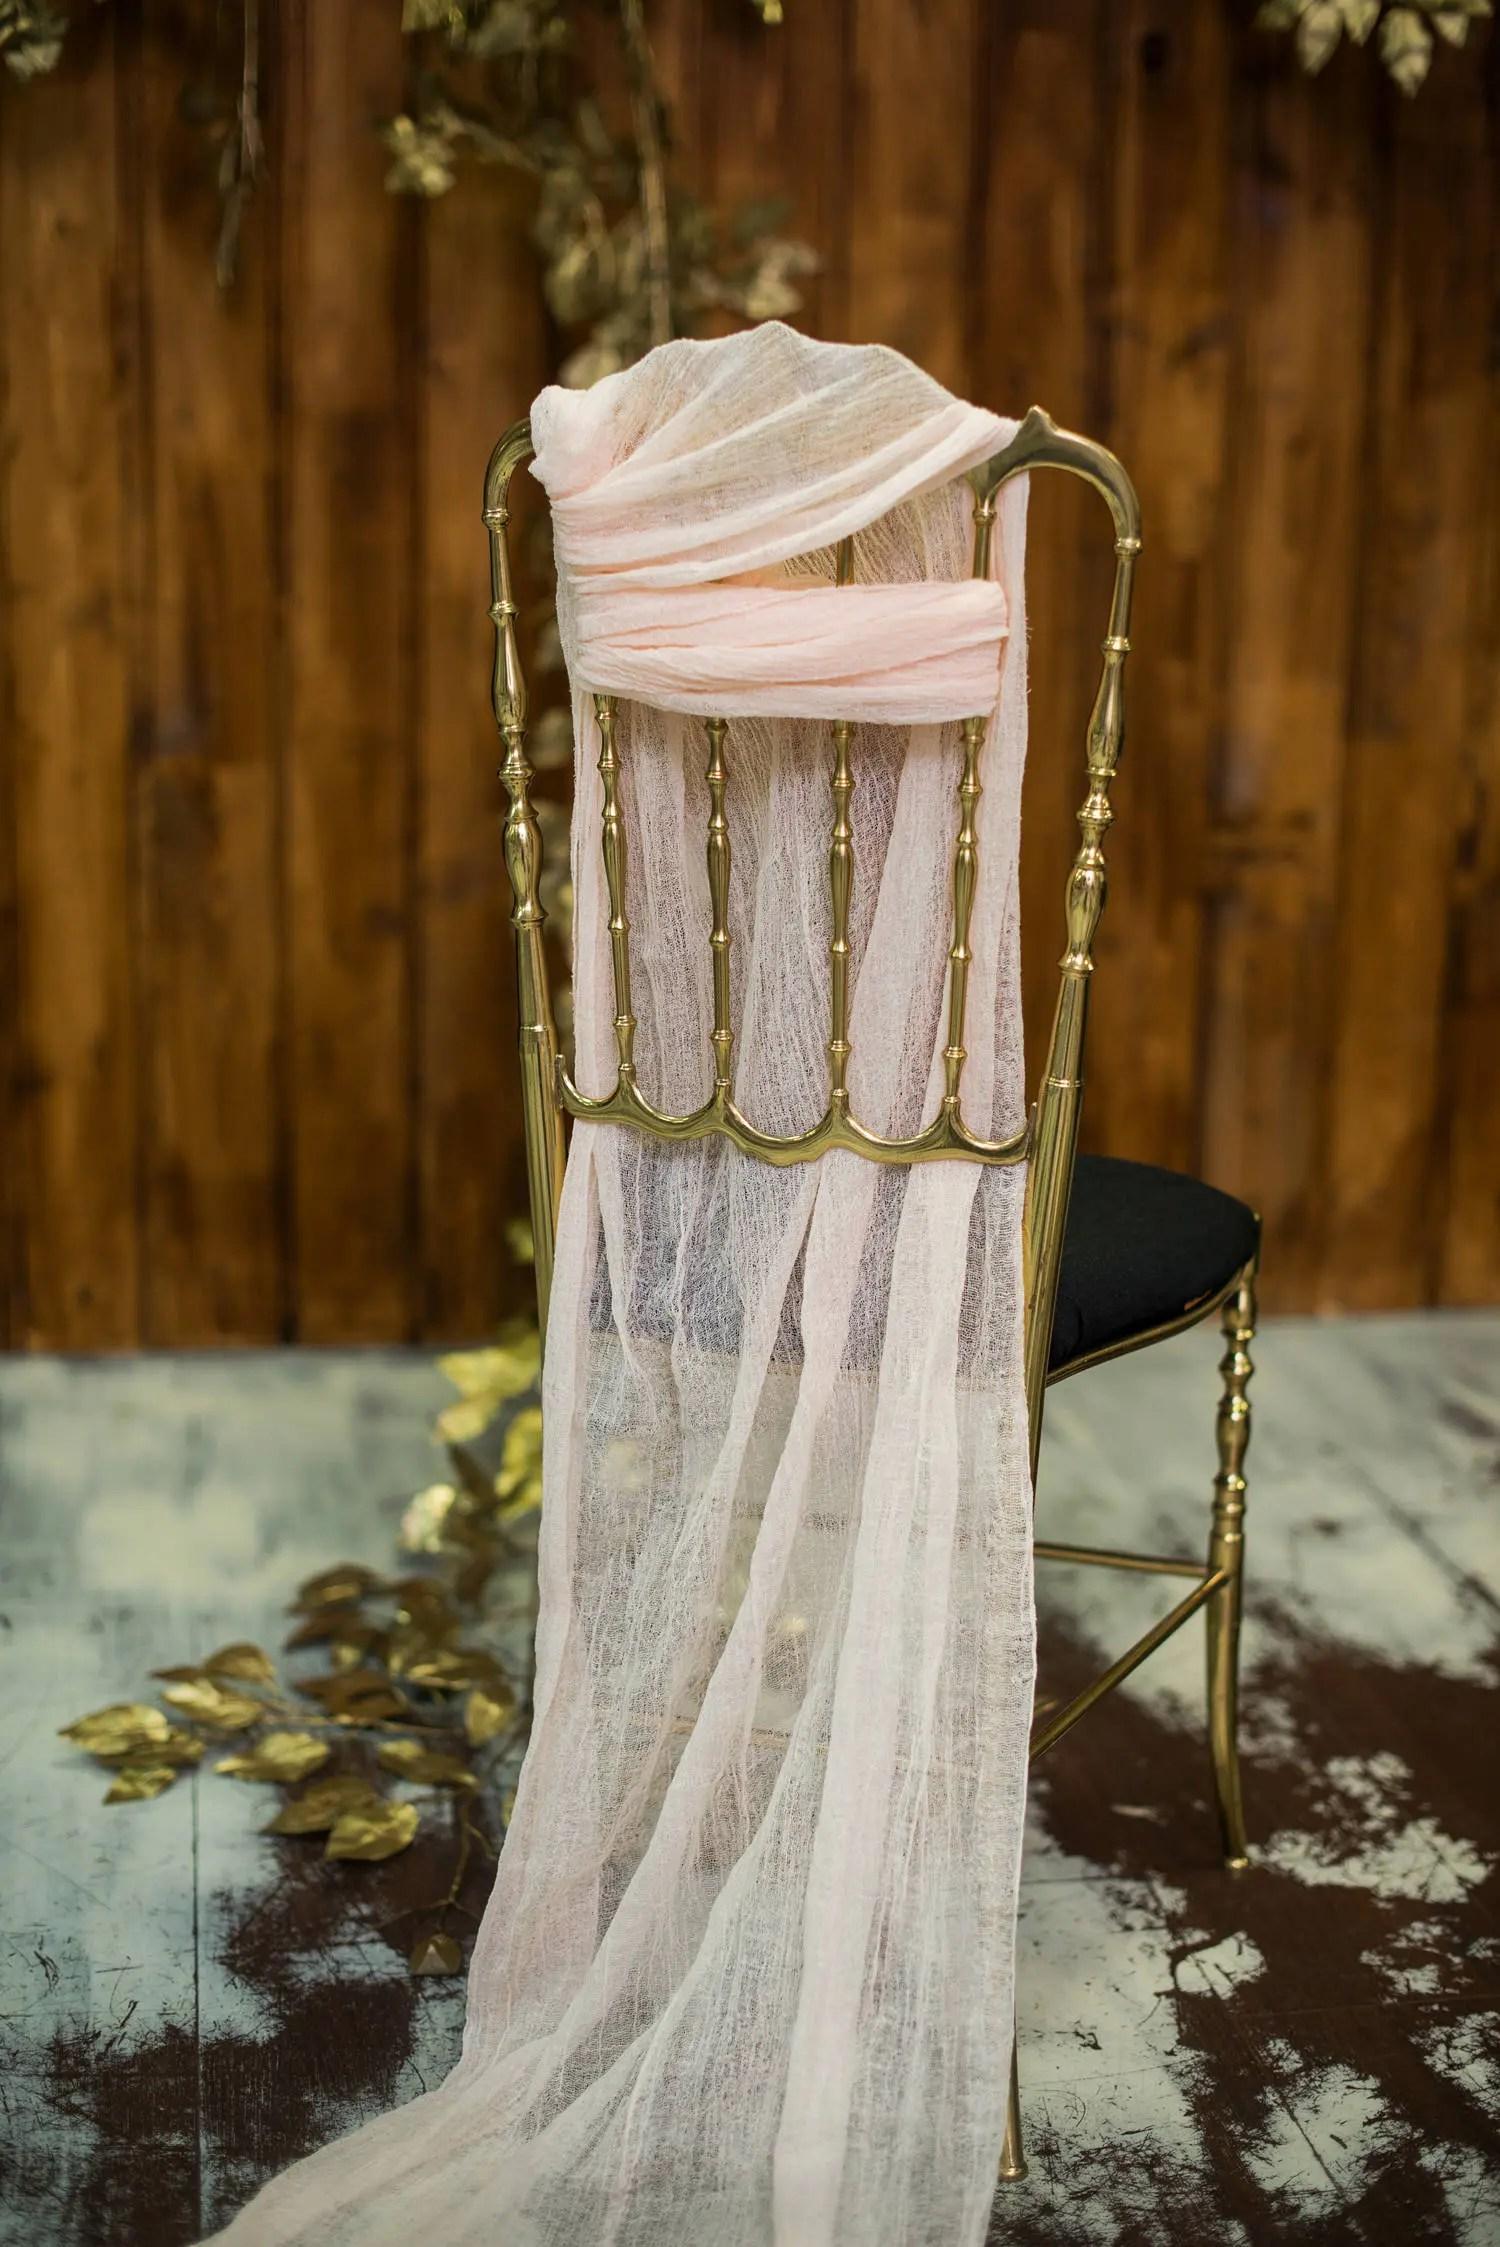 cotton wedding chair covers to buy cedar adirondack sashes gauze sash cover decorations etsy image 0